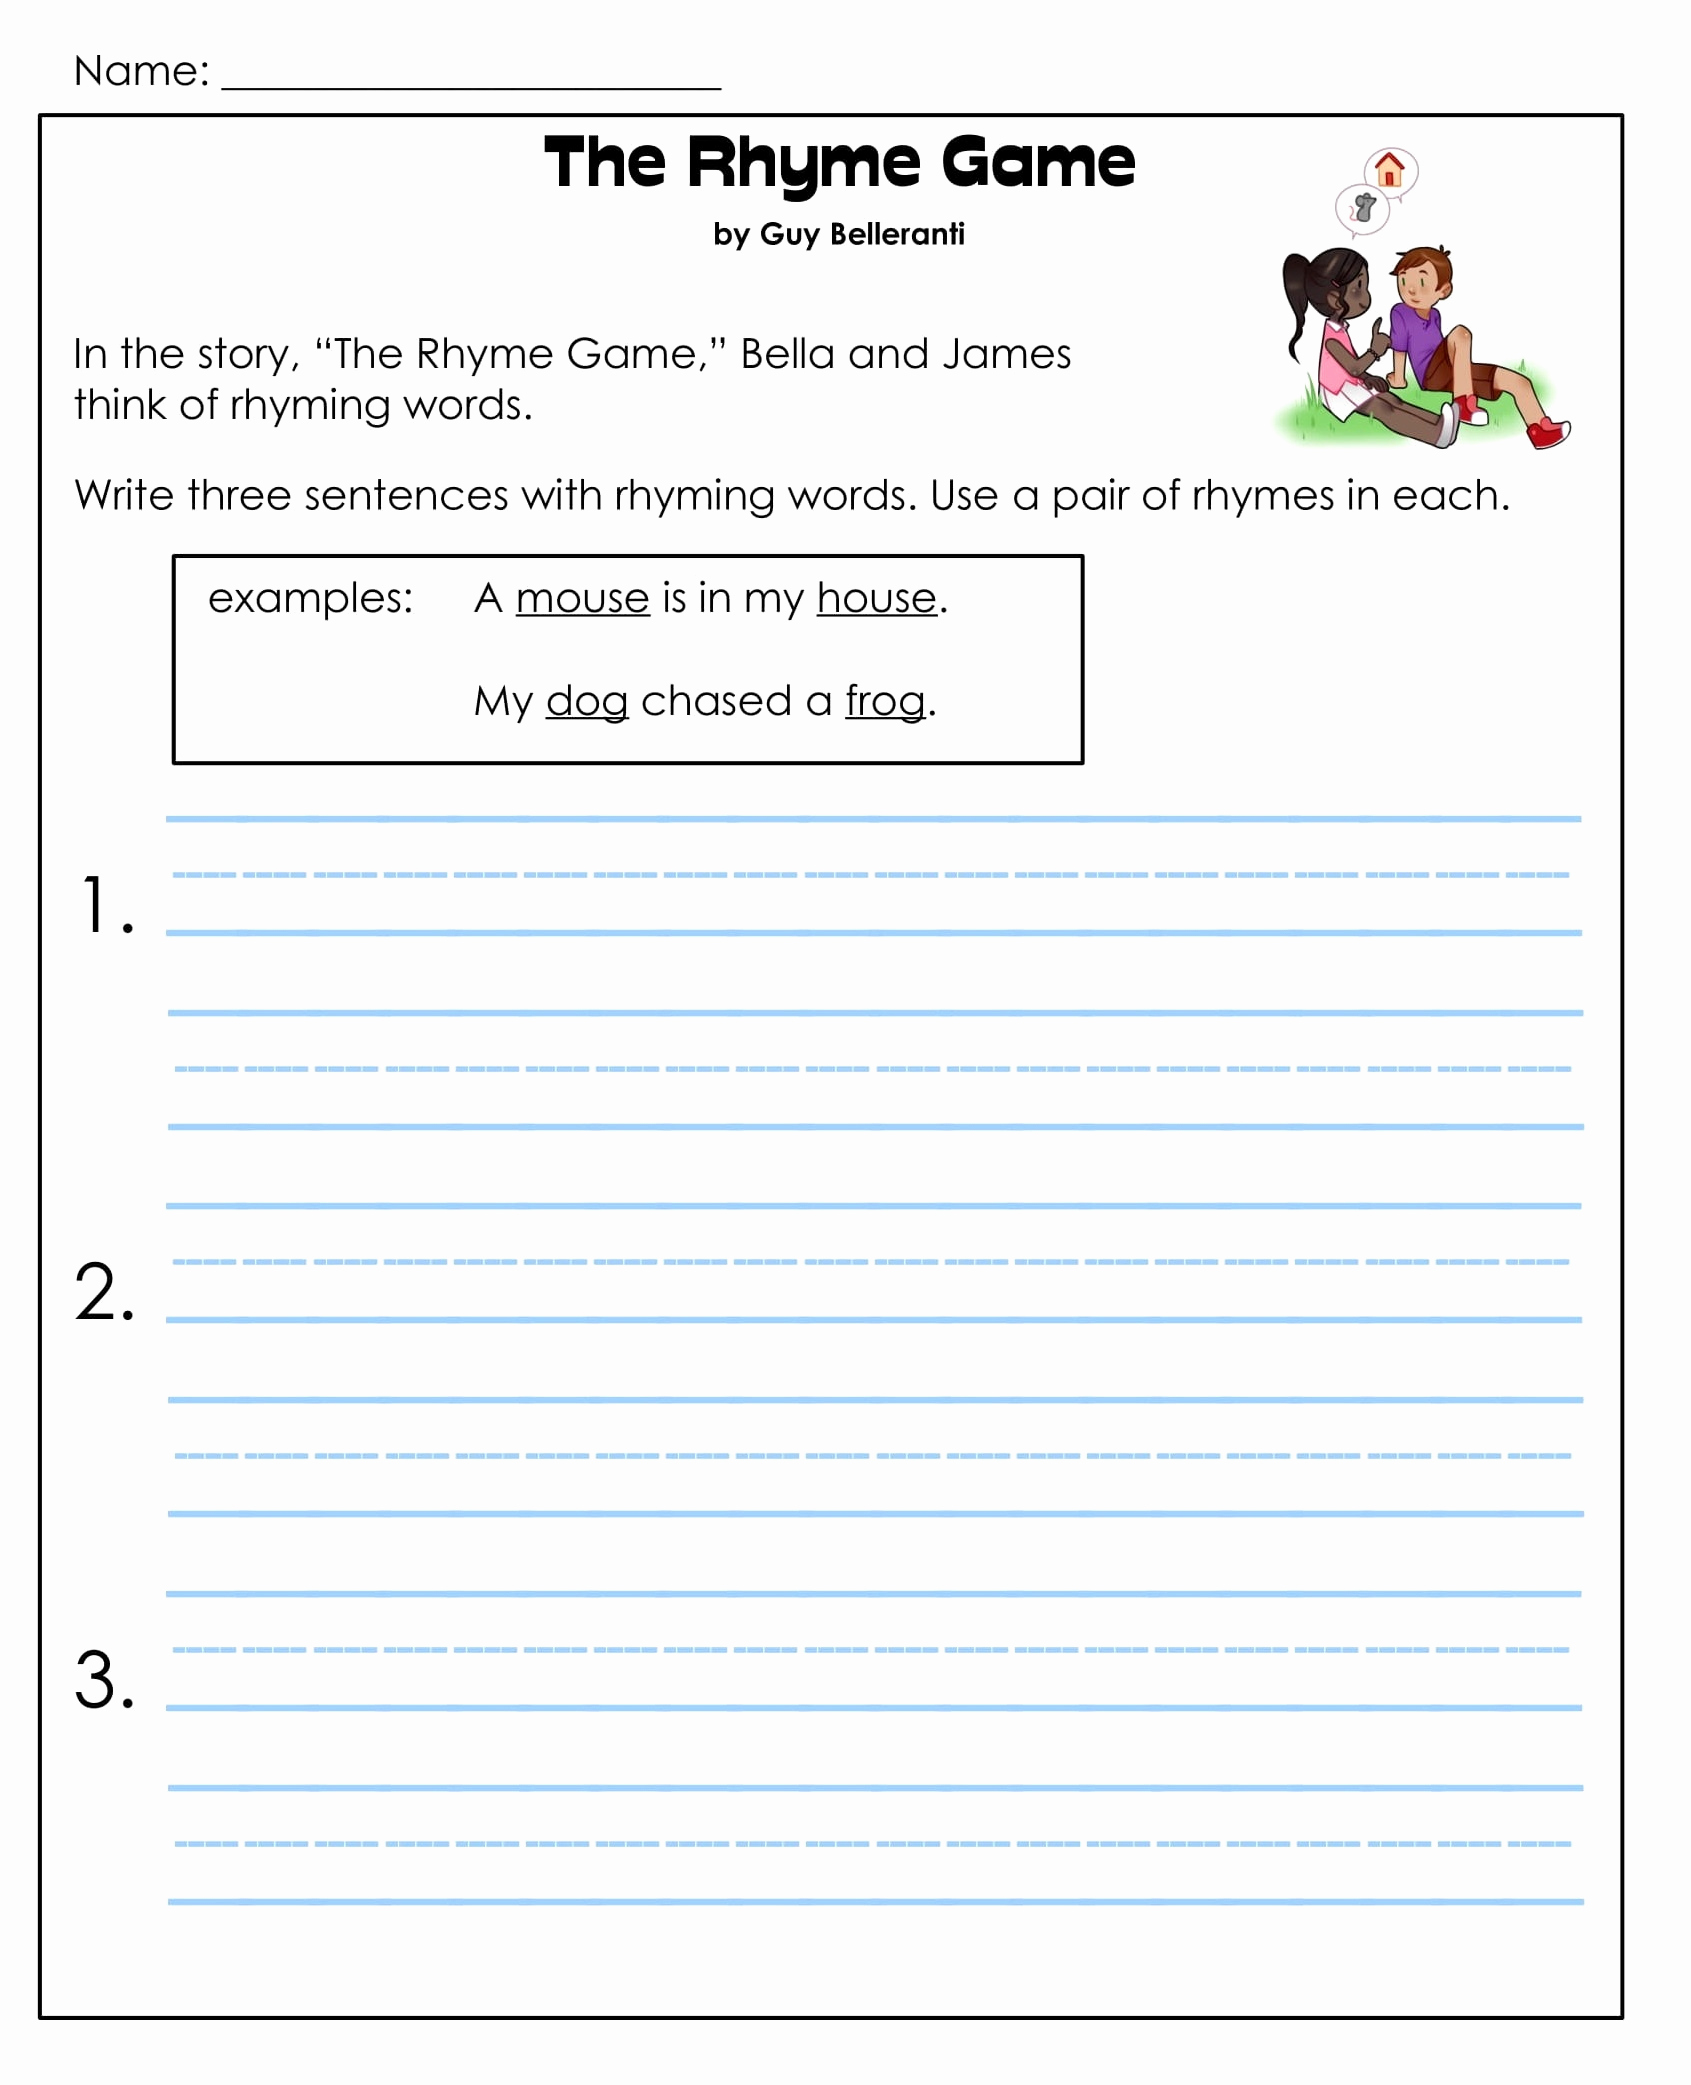 1st Grade Reading Worksheets Printable Inspirational 1st Grade Reading Prehension Worksheets Printable Pdf